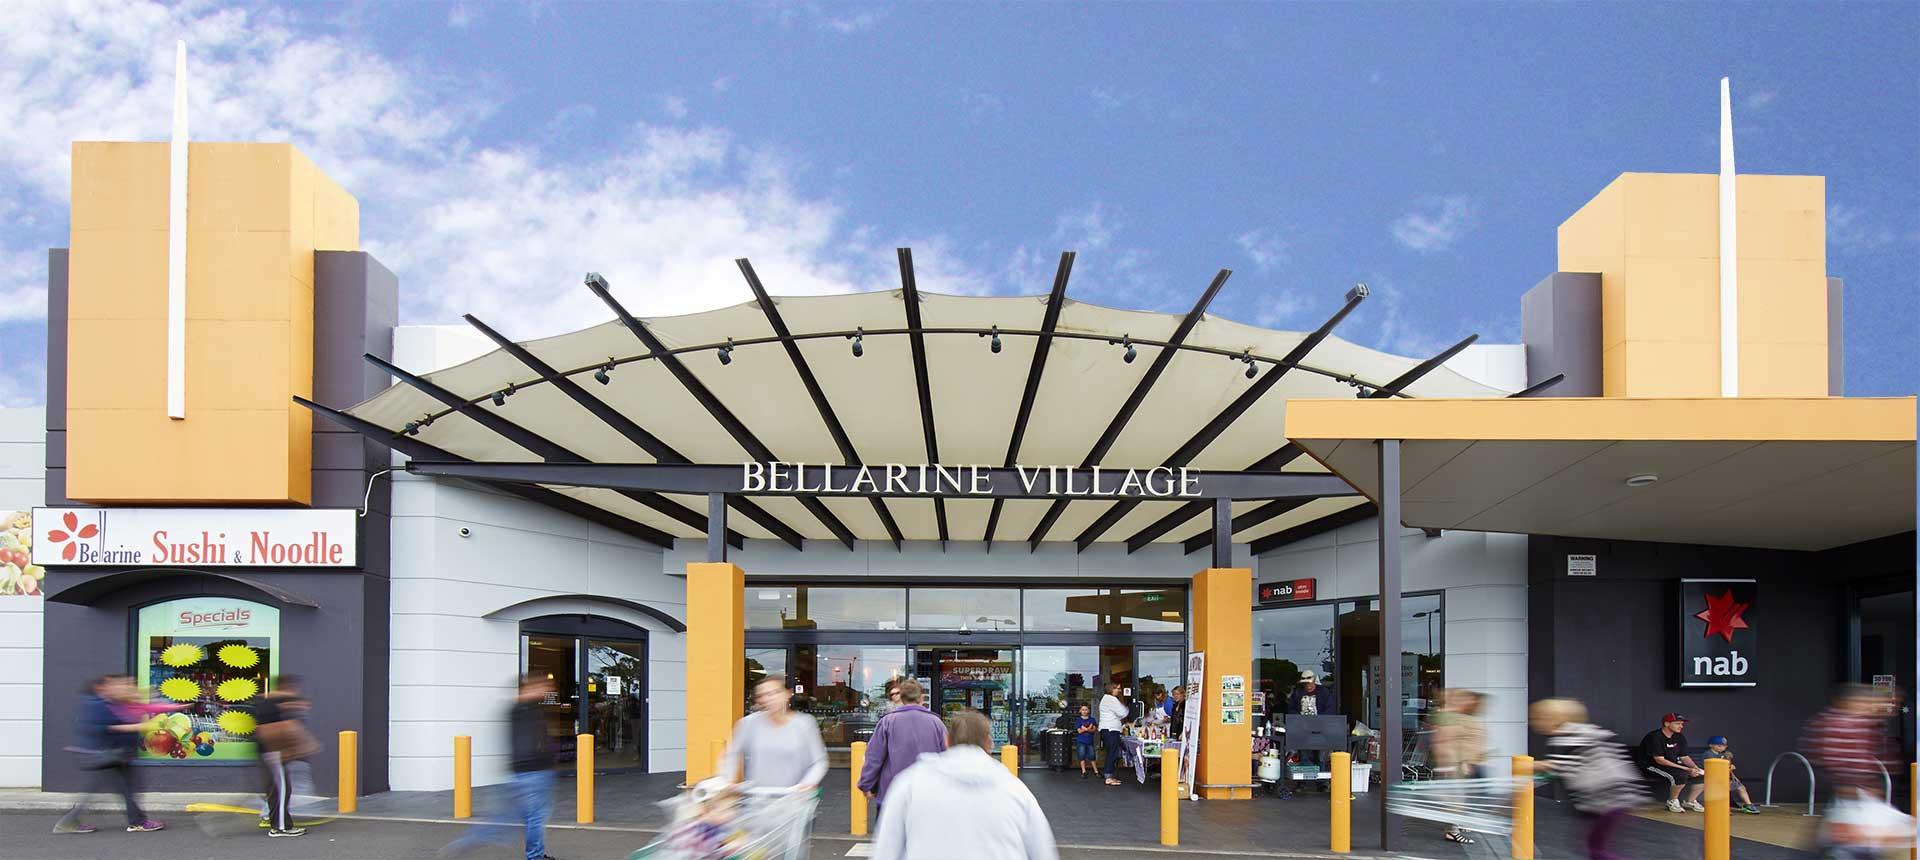 A private Melbourne investor has paid $36.5 million for Bellarine Village Shopping Centre in Newcomb, Victoria.